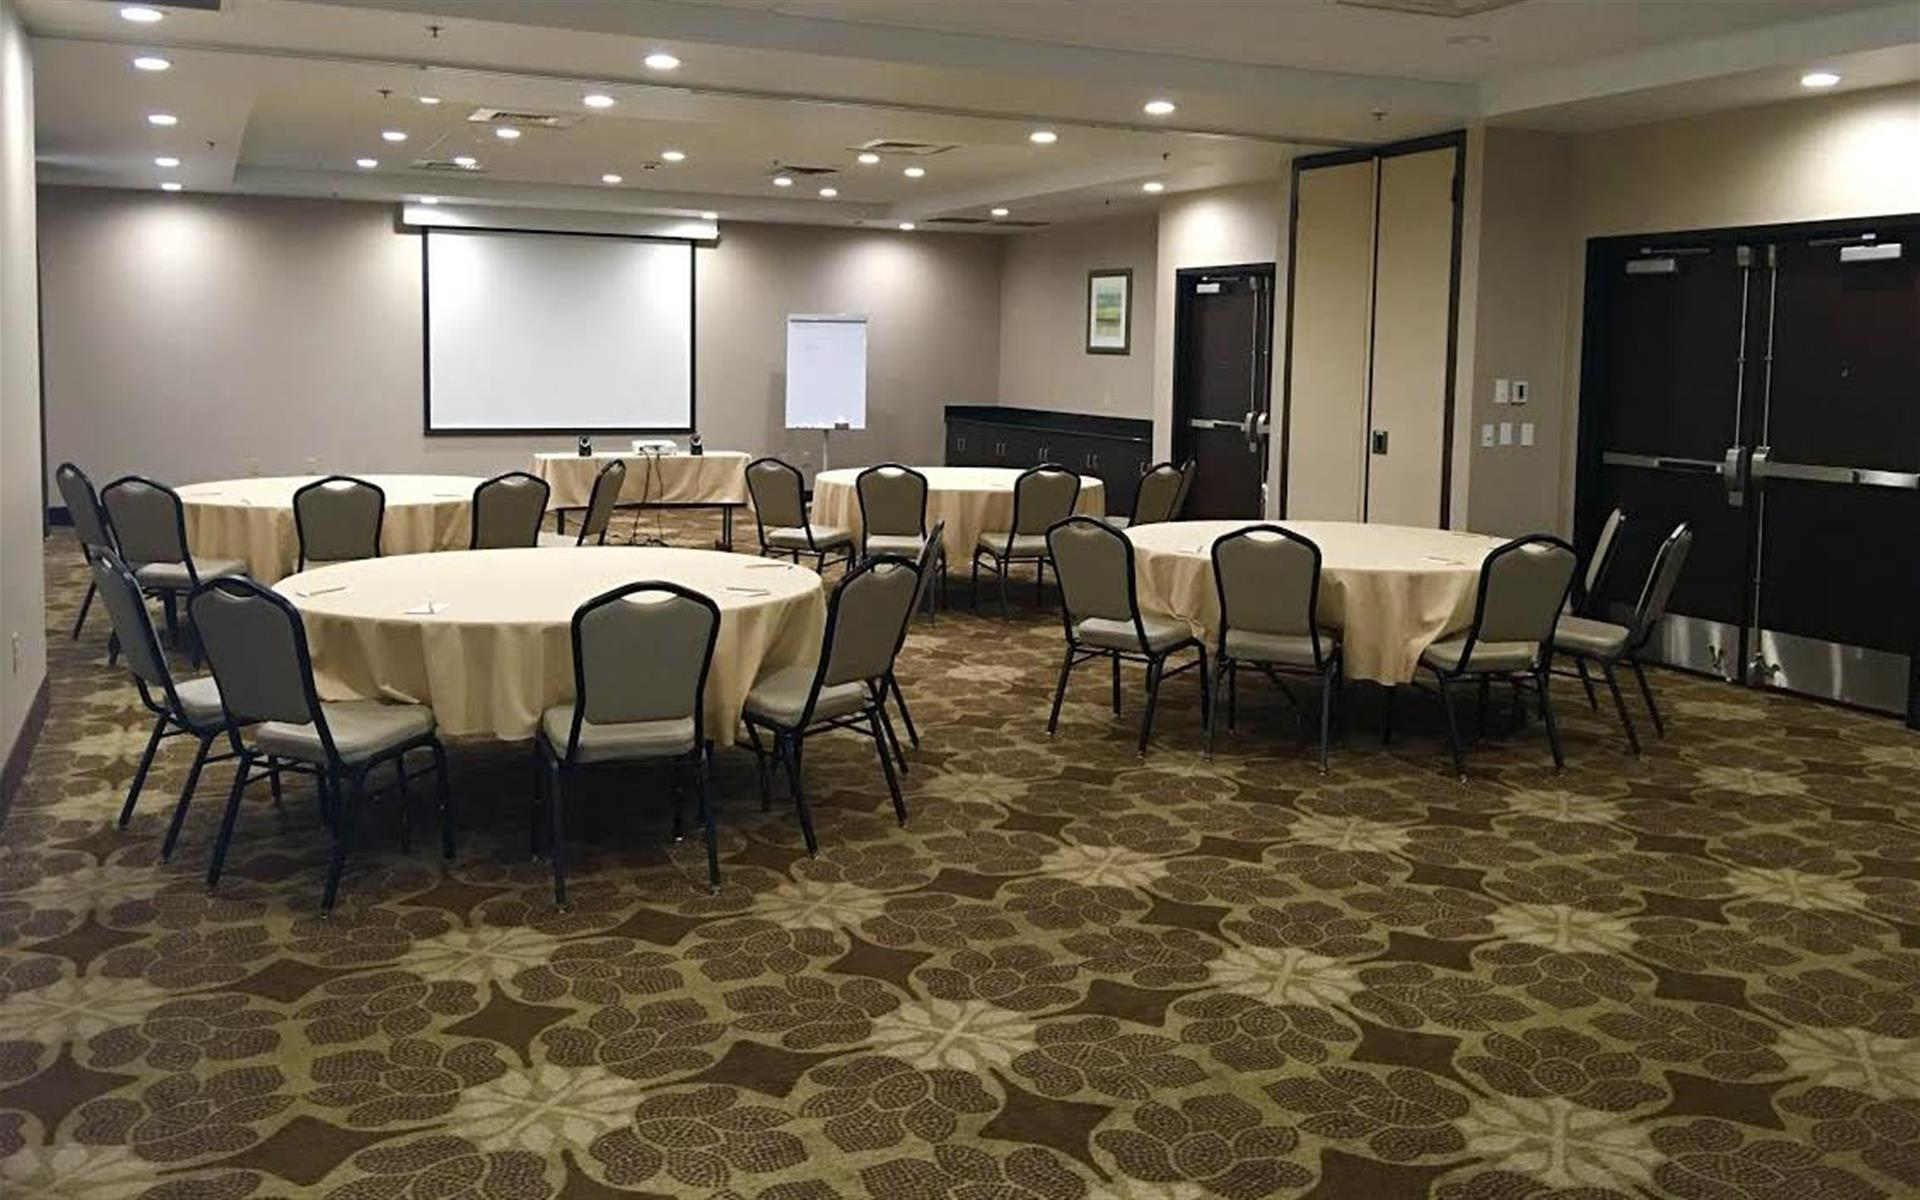 Hilton Garden Inn Austin NW/Arboretum - Large Capitol Meeting Room